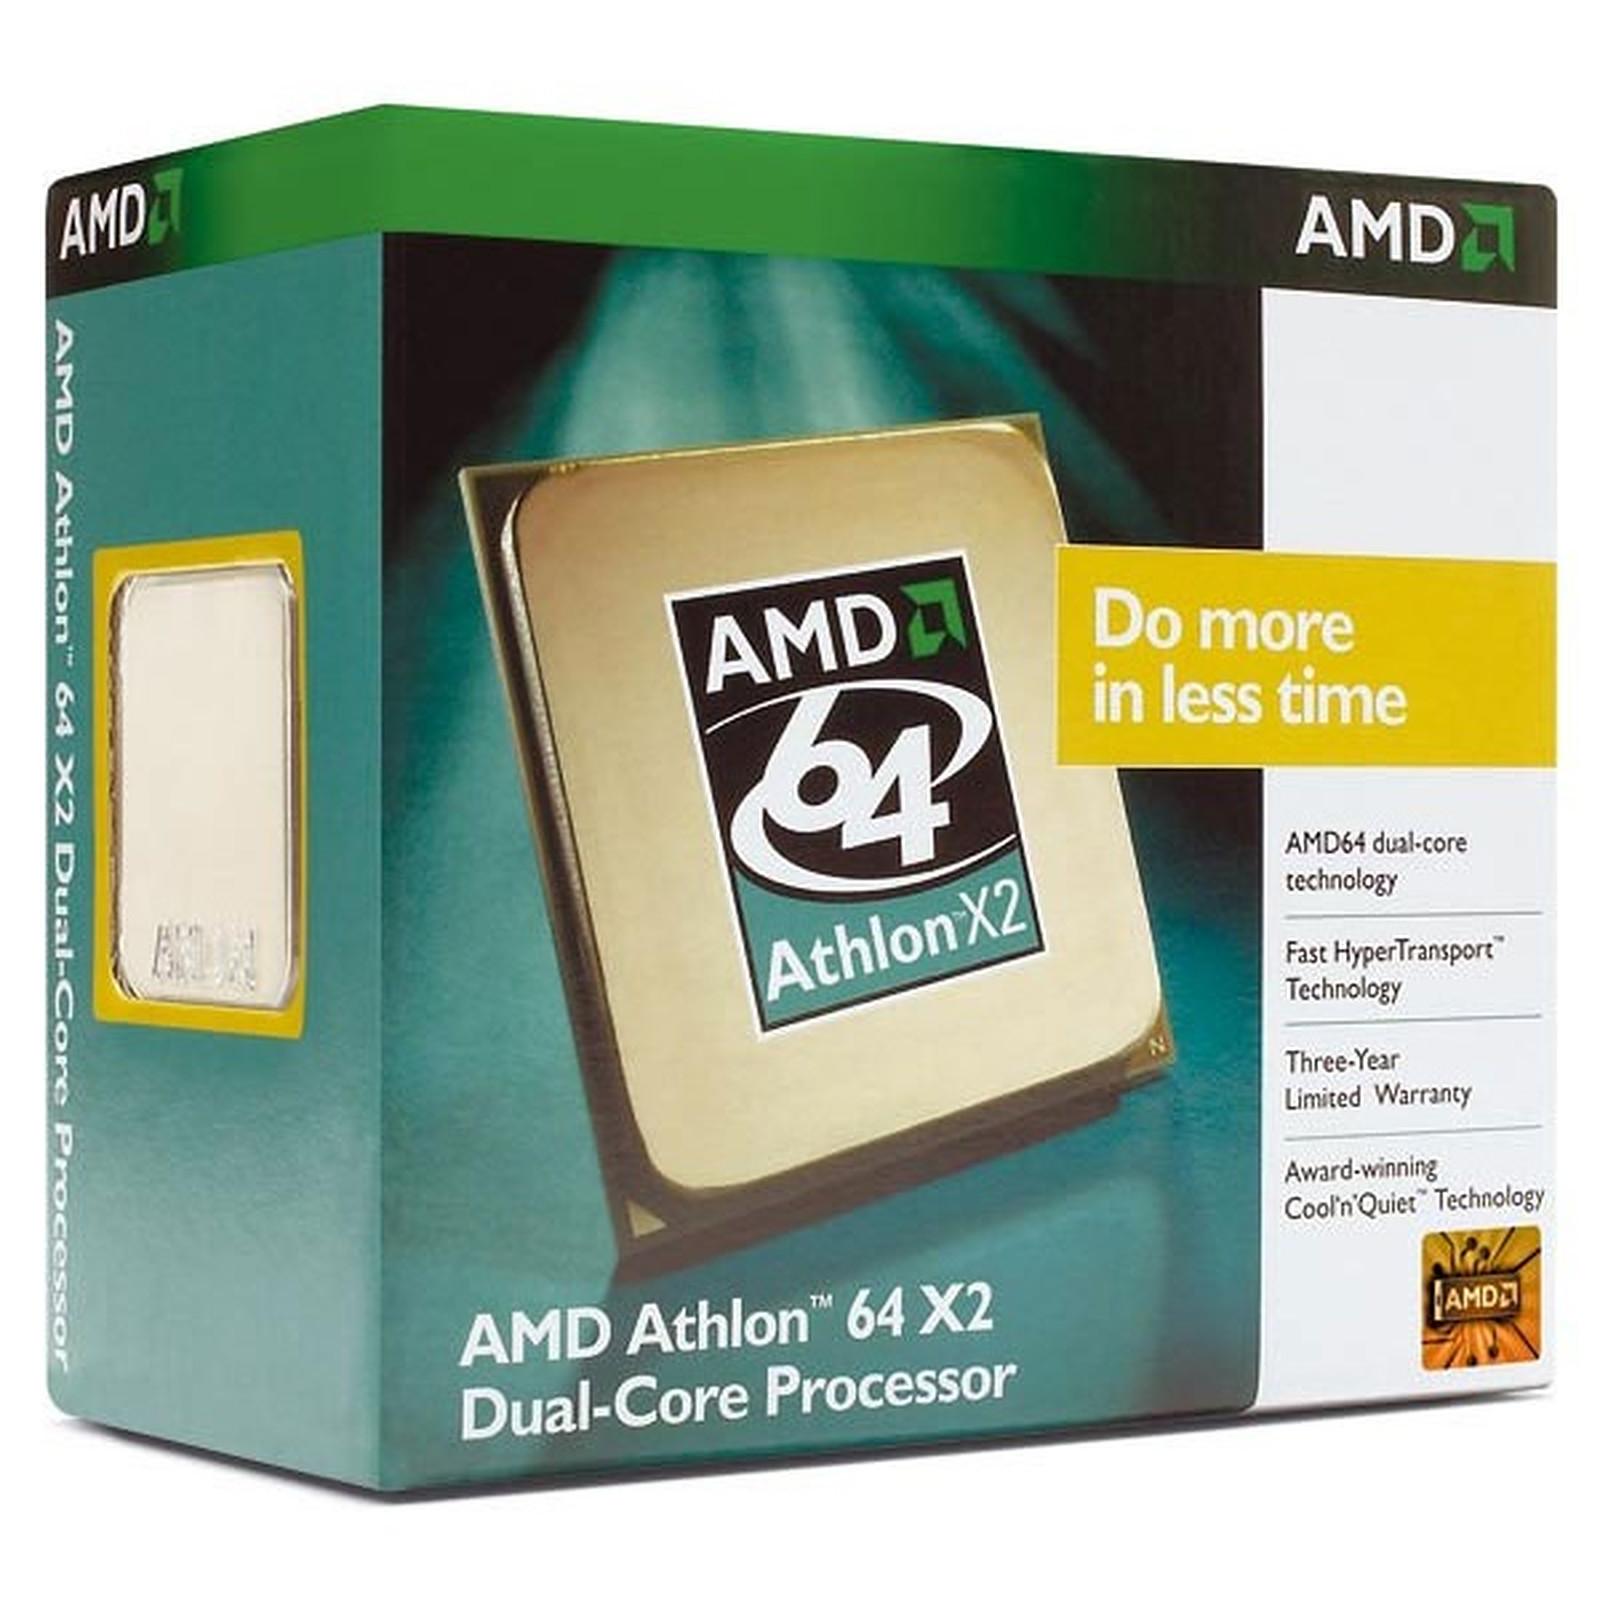 AMD Athlon 64 X2 Dual-Core 5400+ ADA5400CZBOX